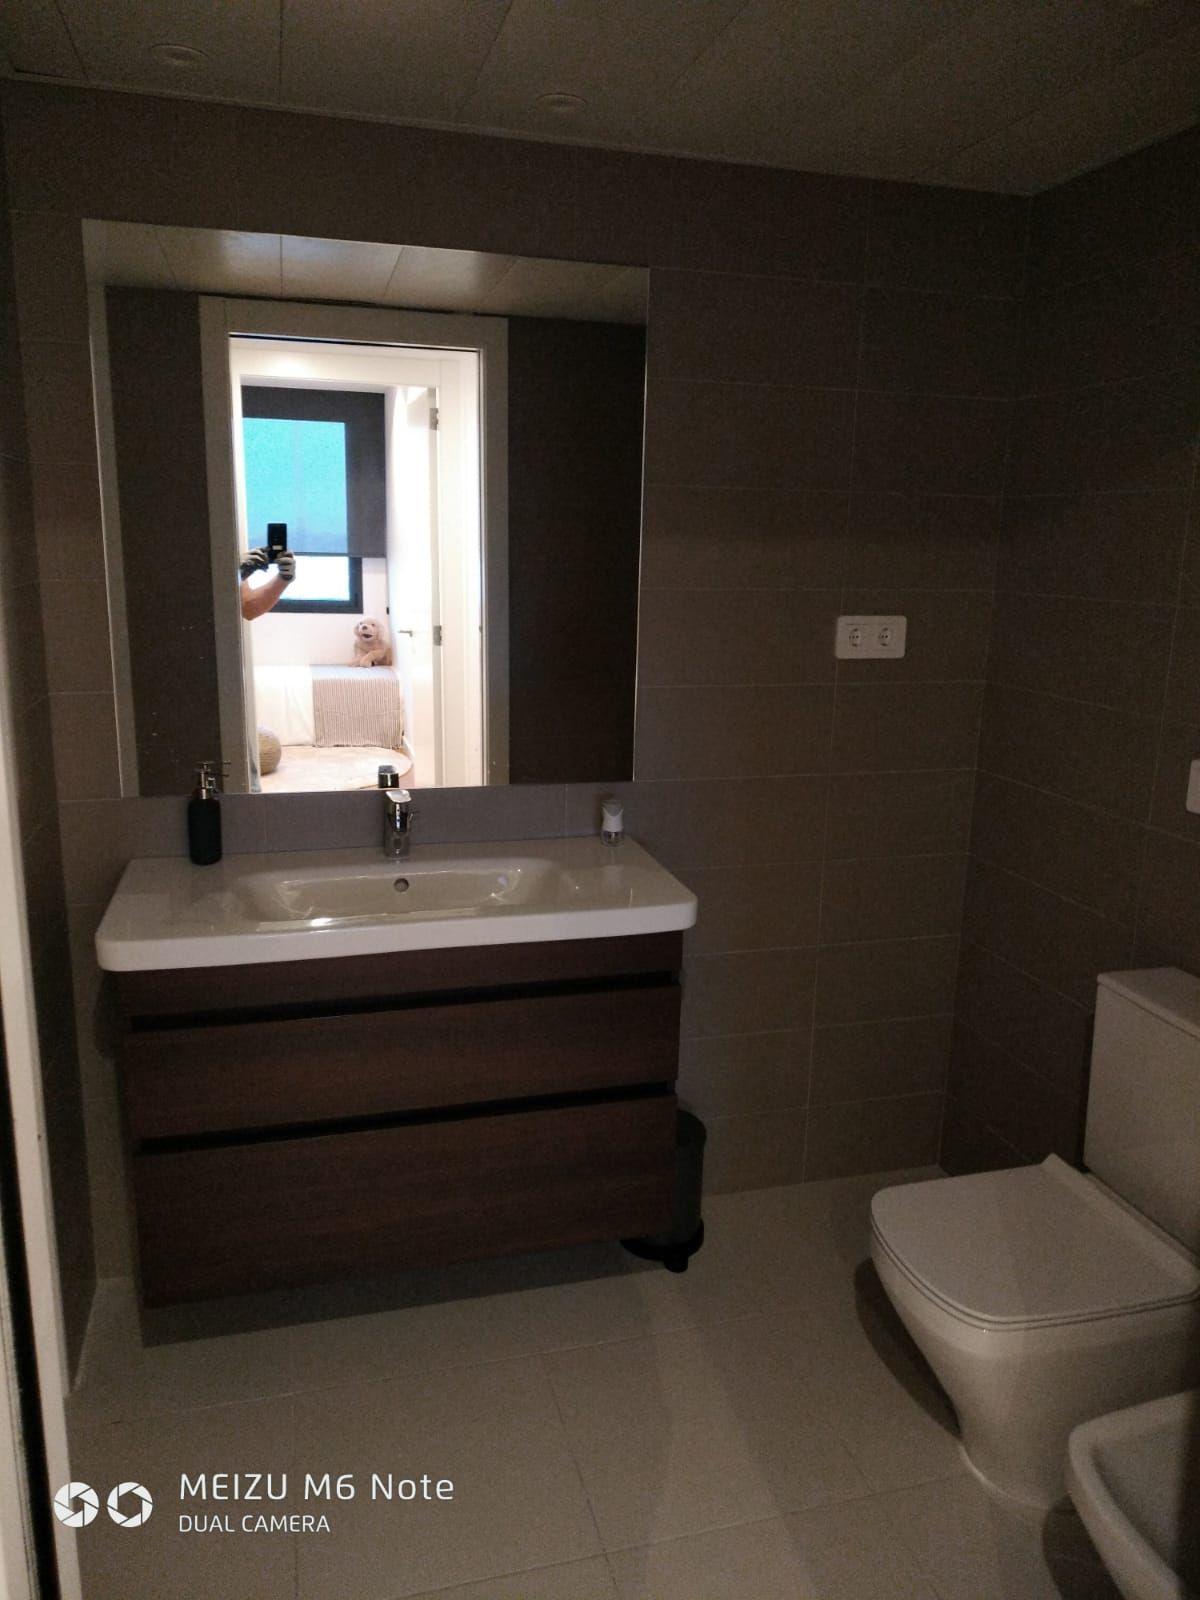 Ideal bathrooms